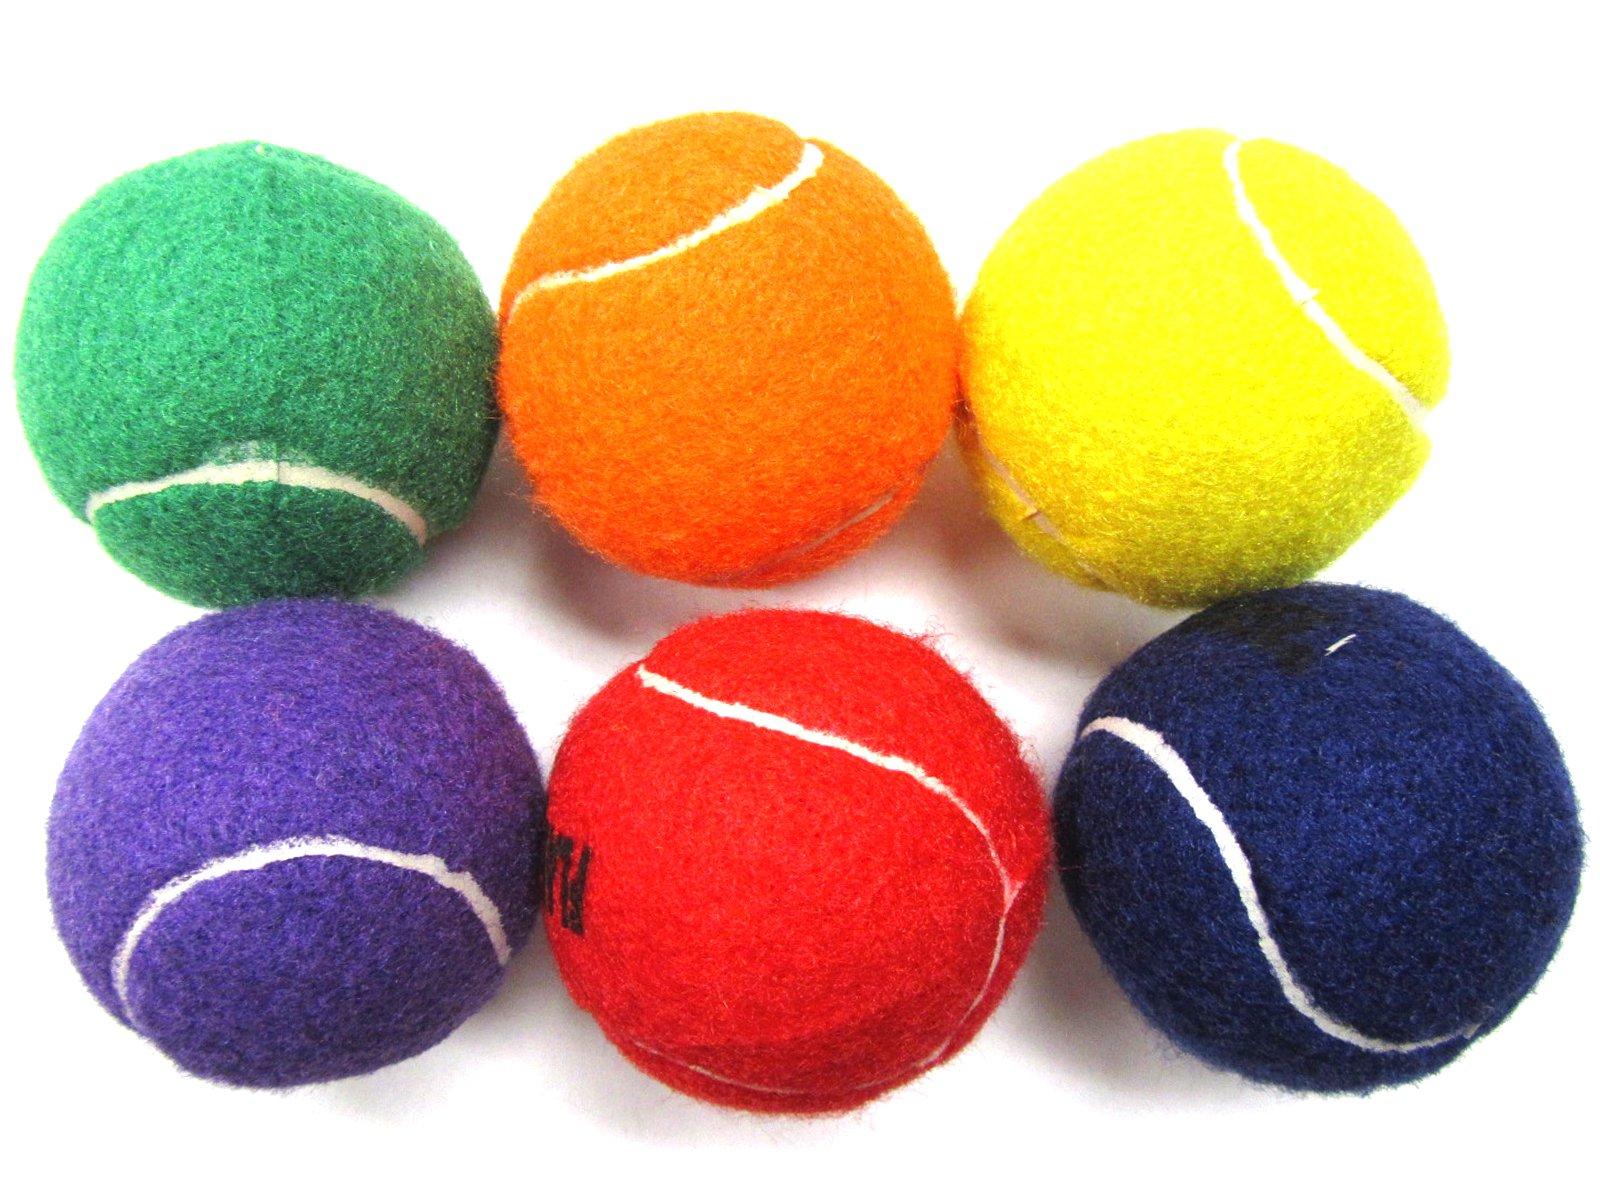 Voltare Color Tennis Ball Set | Green, Orange, Yellow, Purple, Red, Blue Tennis Balls | (6 Pack)